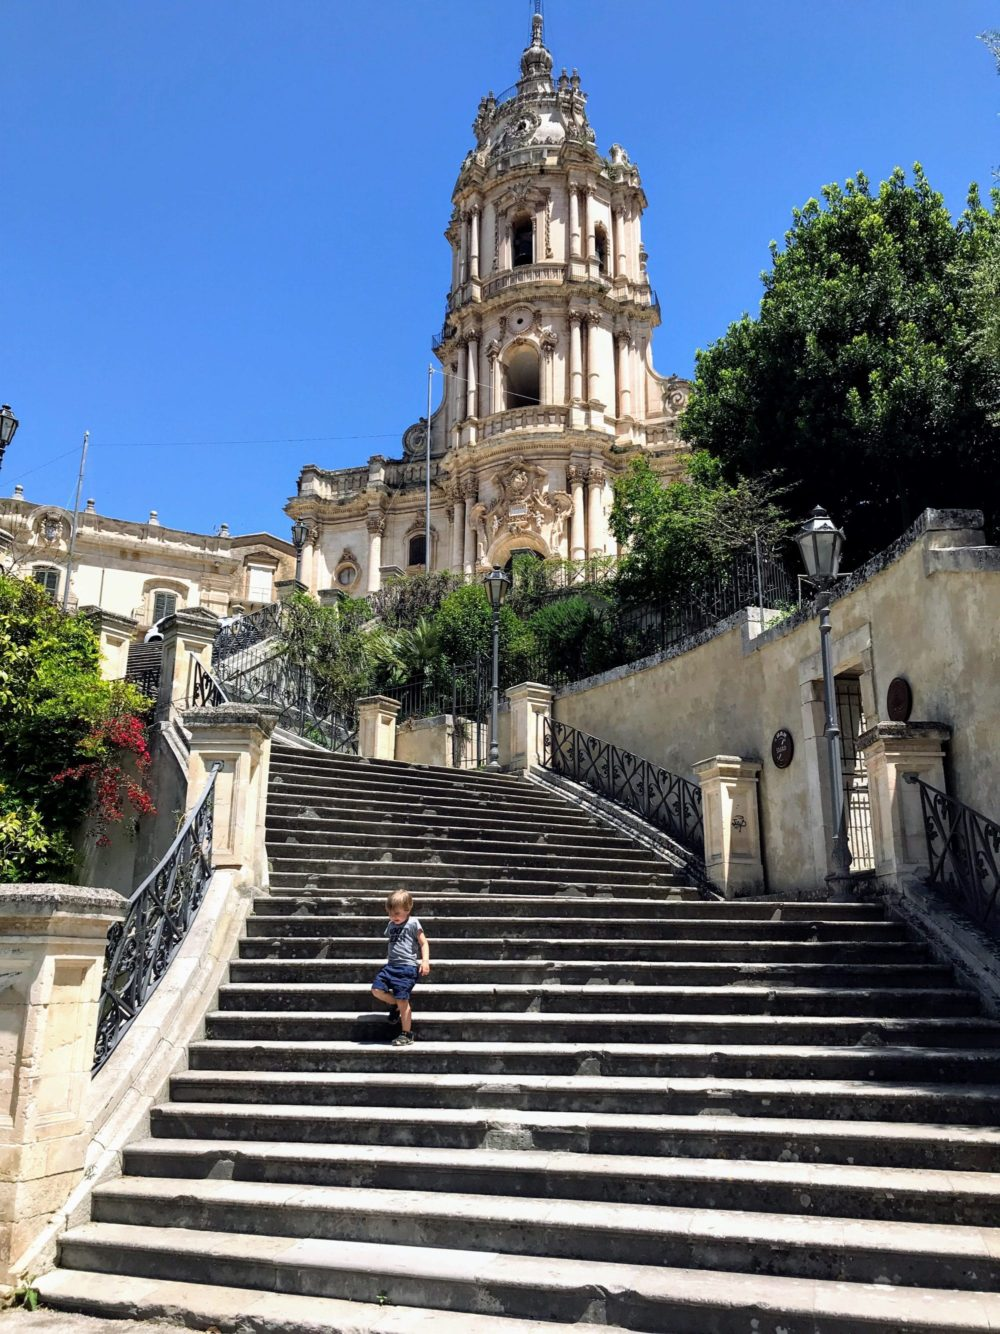 Entry to Gli Orti Di San Giorgio via the Stairway to Duomo San Giorgio